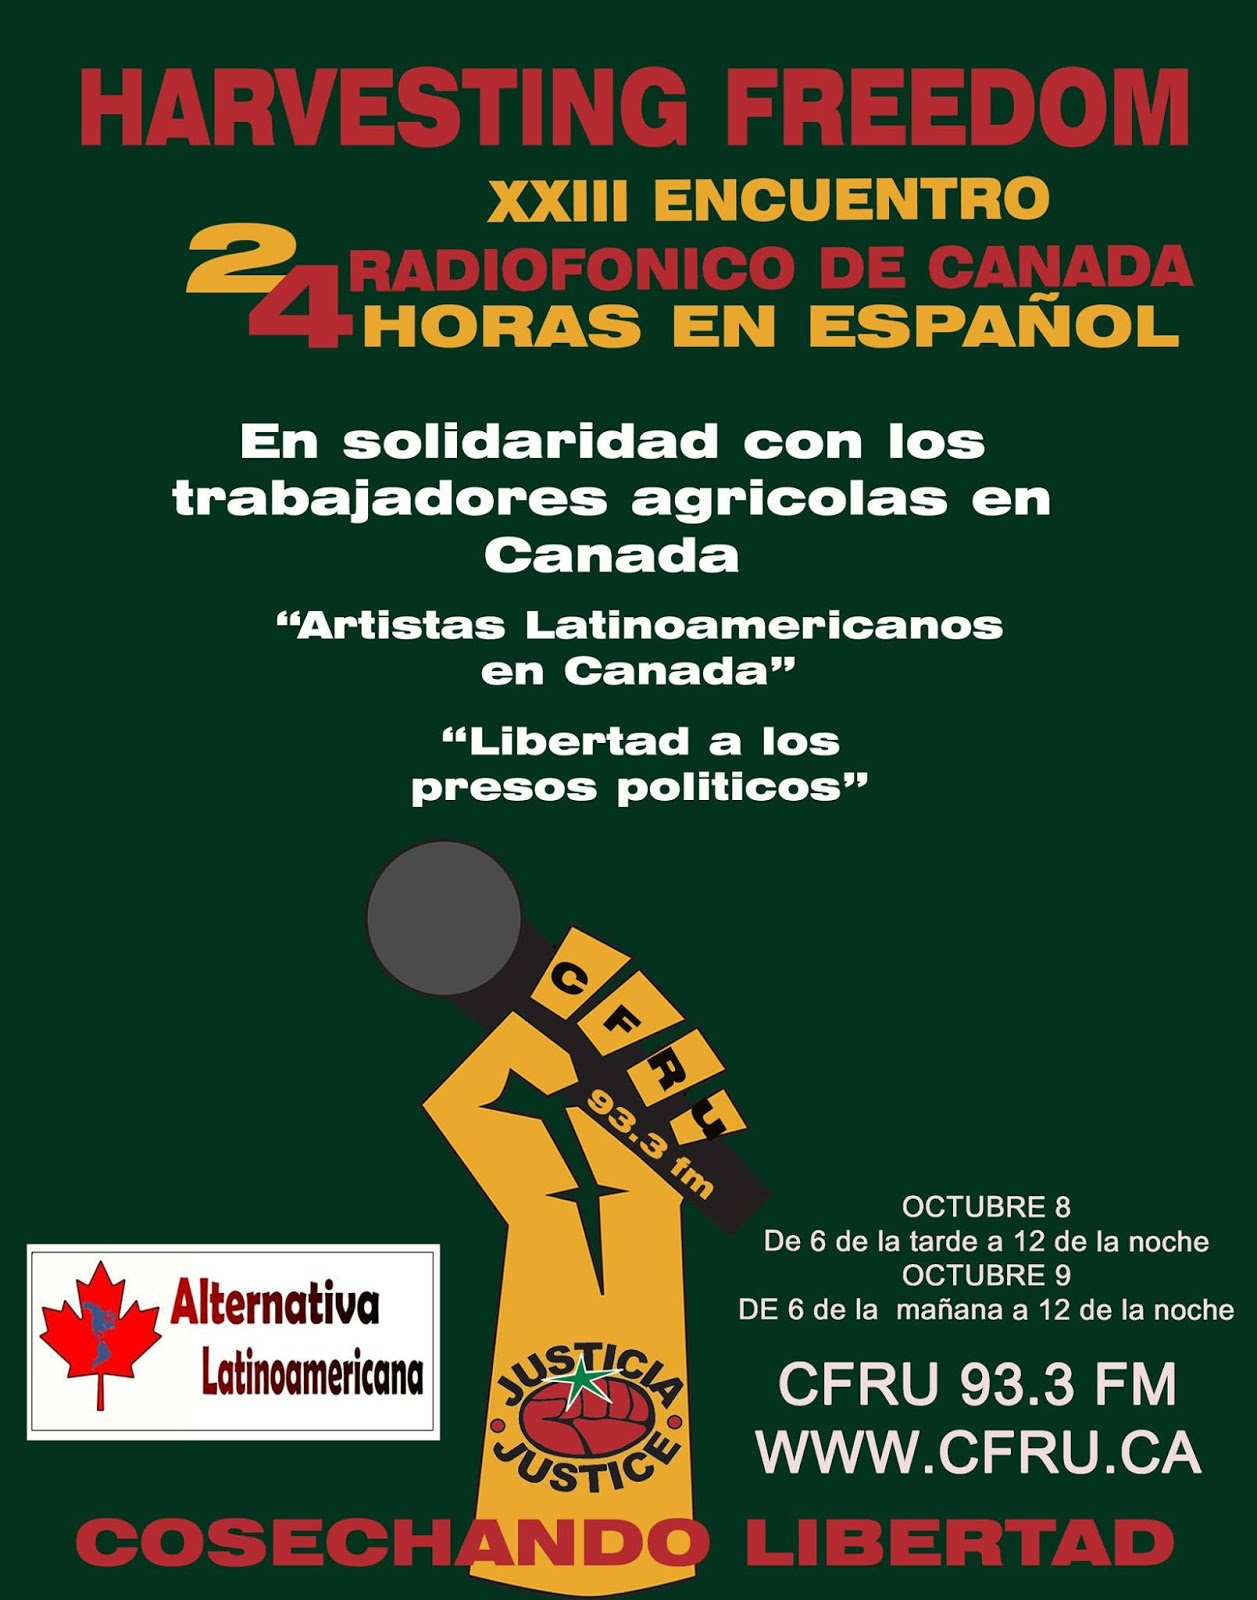 XXIII Encuentro Radiofonico de Canada